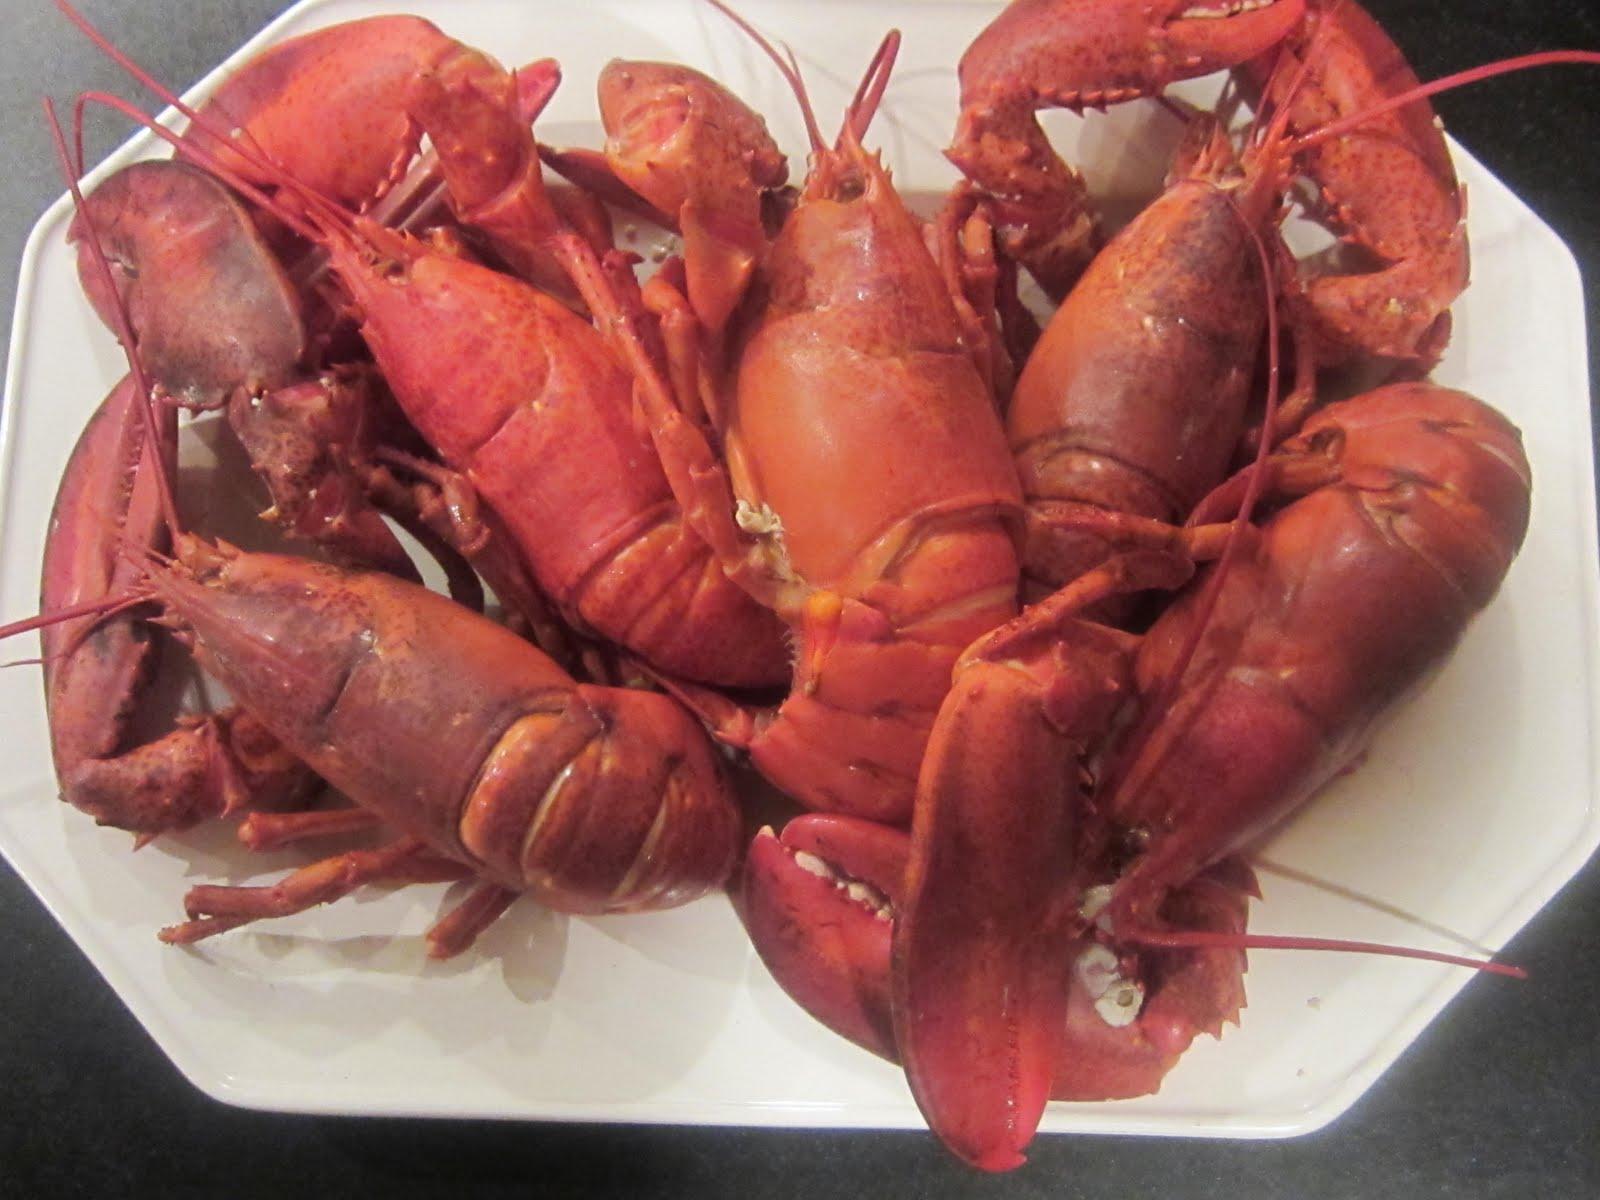 Betty Rosbottom: The Great Lobster Debate